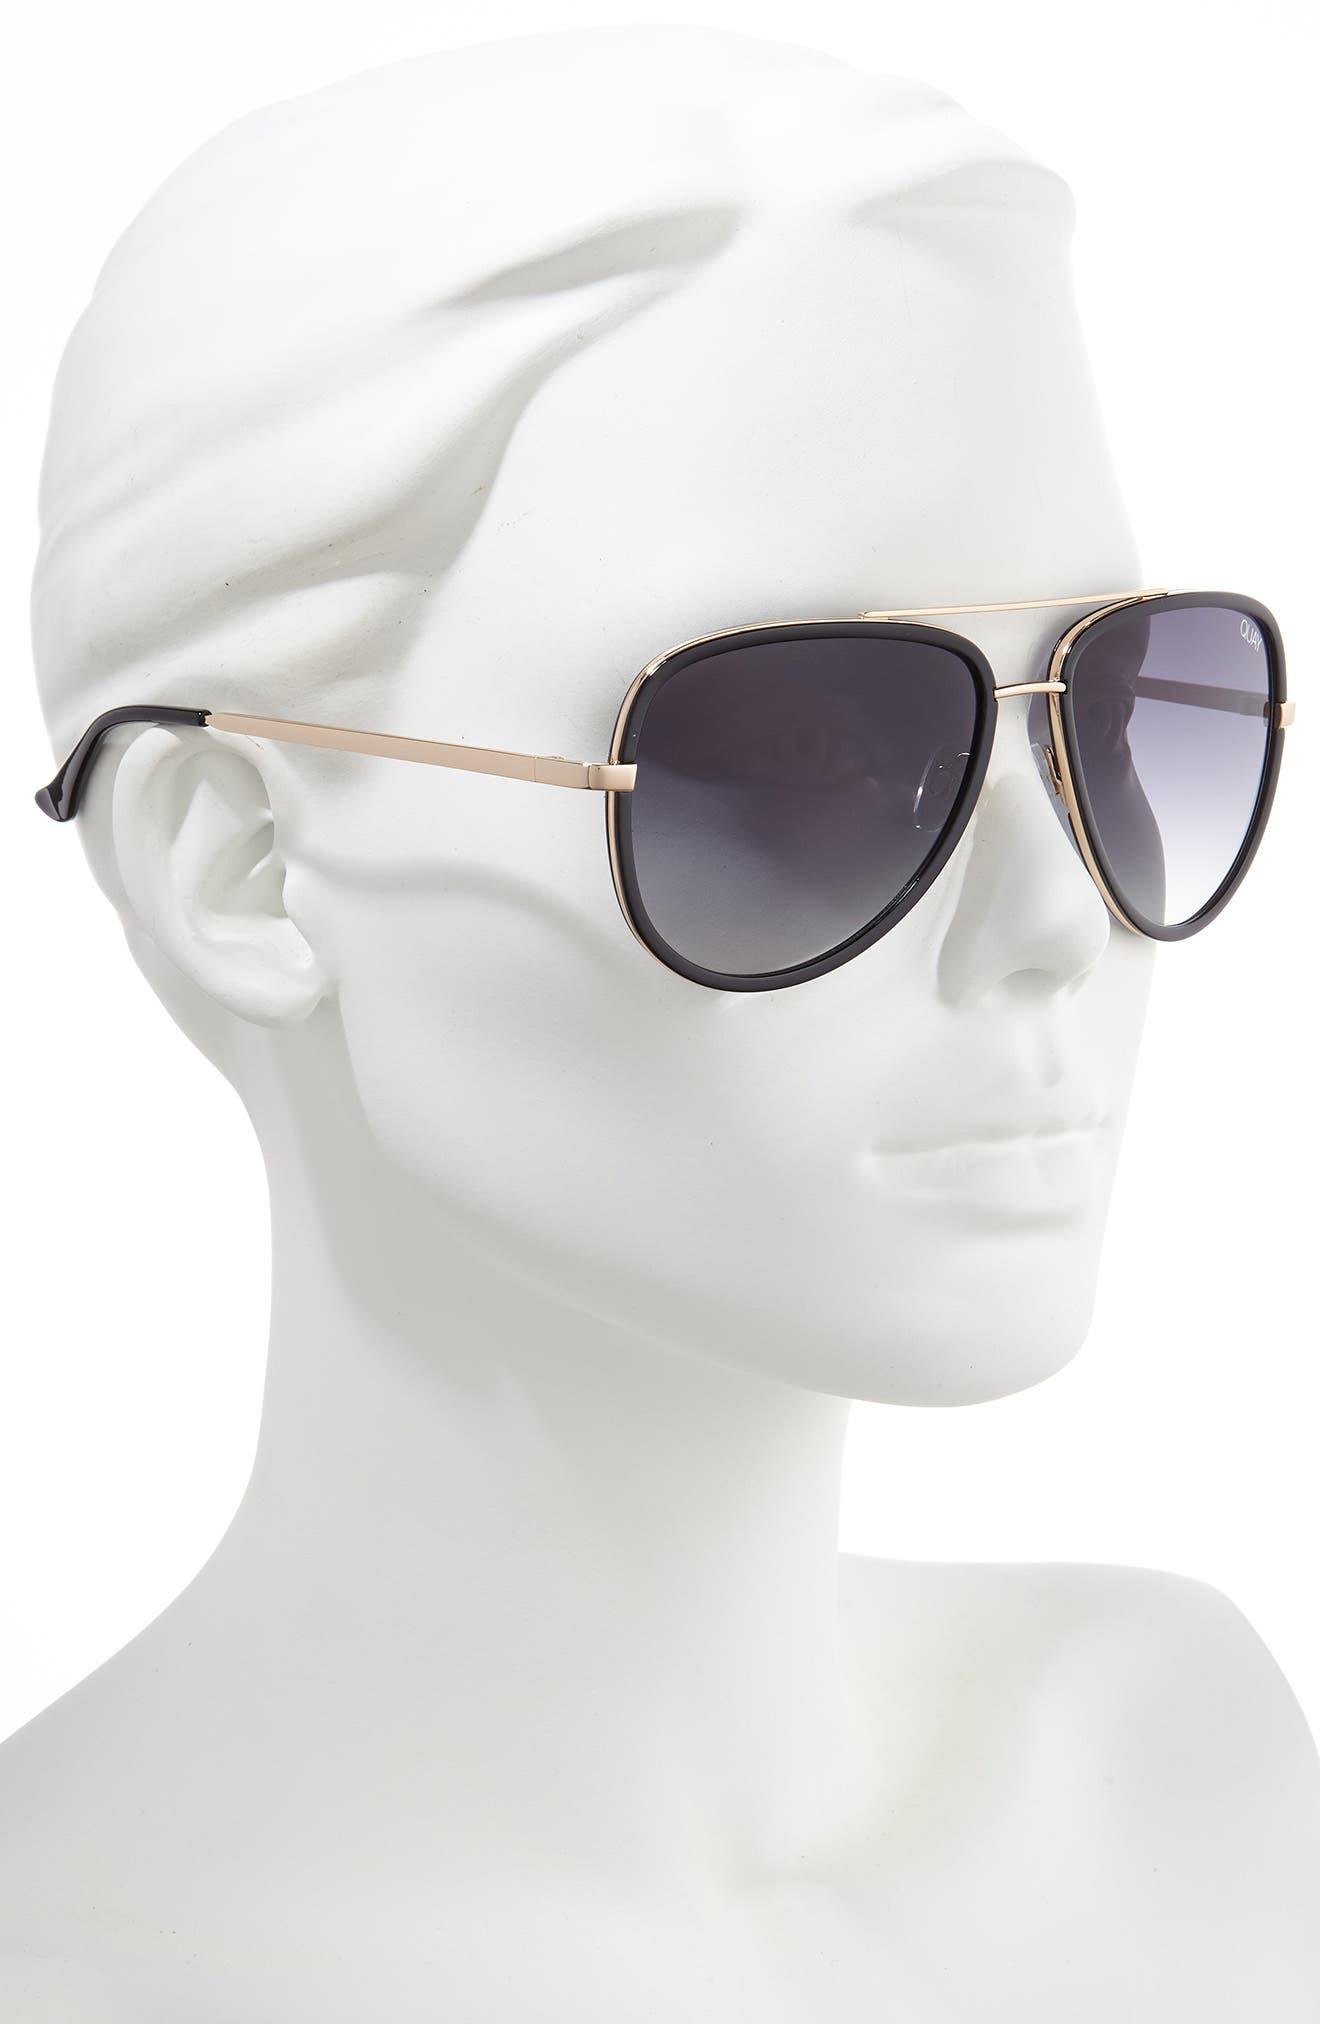 QUAY AUSTRALIA, x JLO All In 56mm Aviator Sunglasses, Alternate thumbnail 2, color, BLACK/ SMOKE FADE